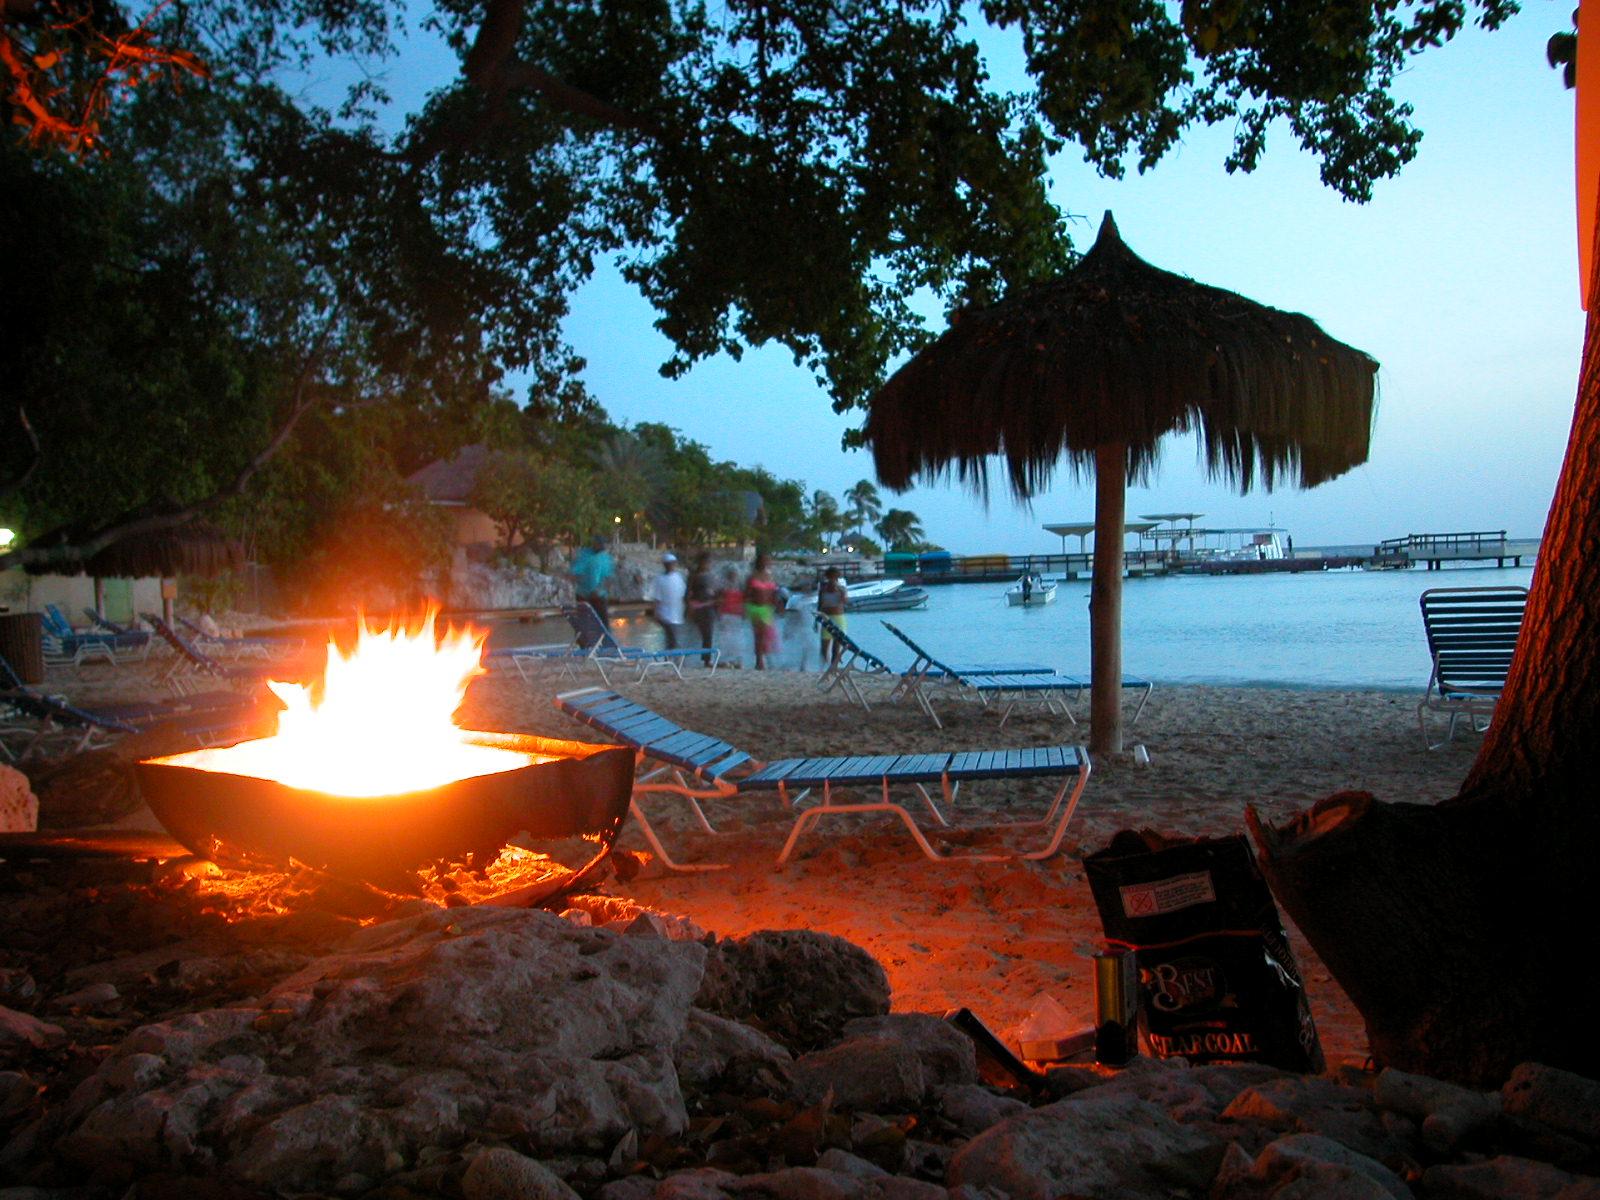 tropical tropic tropics beach party beachparty open fire warm warming flames flame cosy parasol sundown